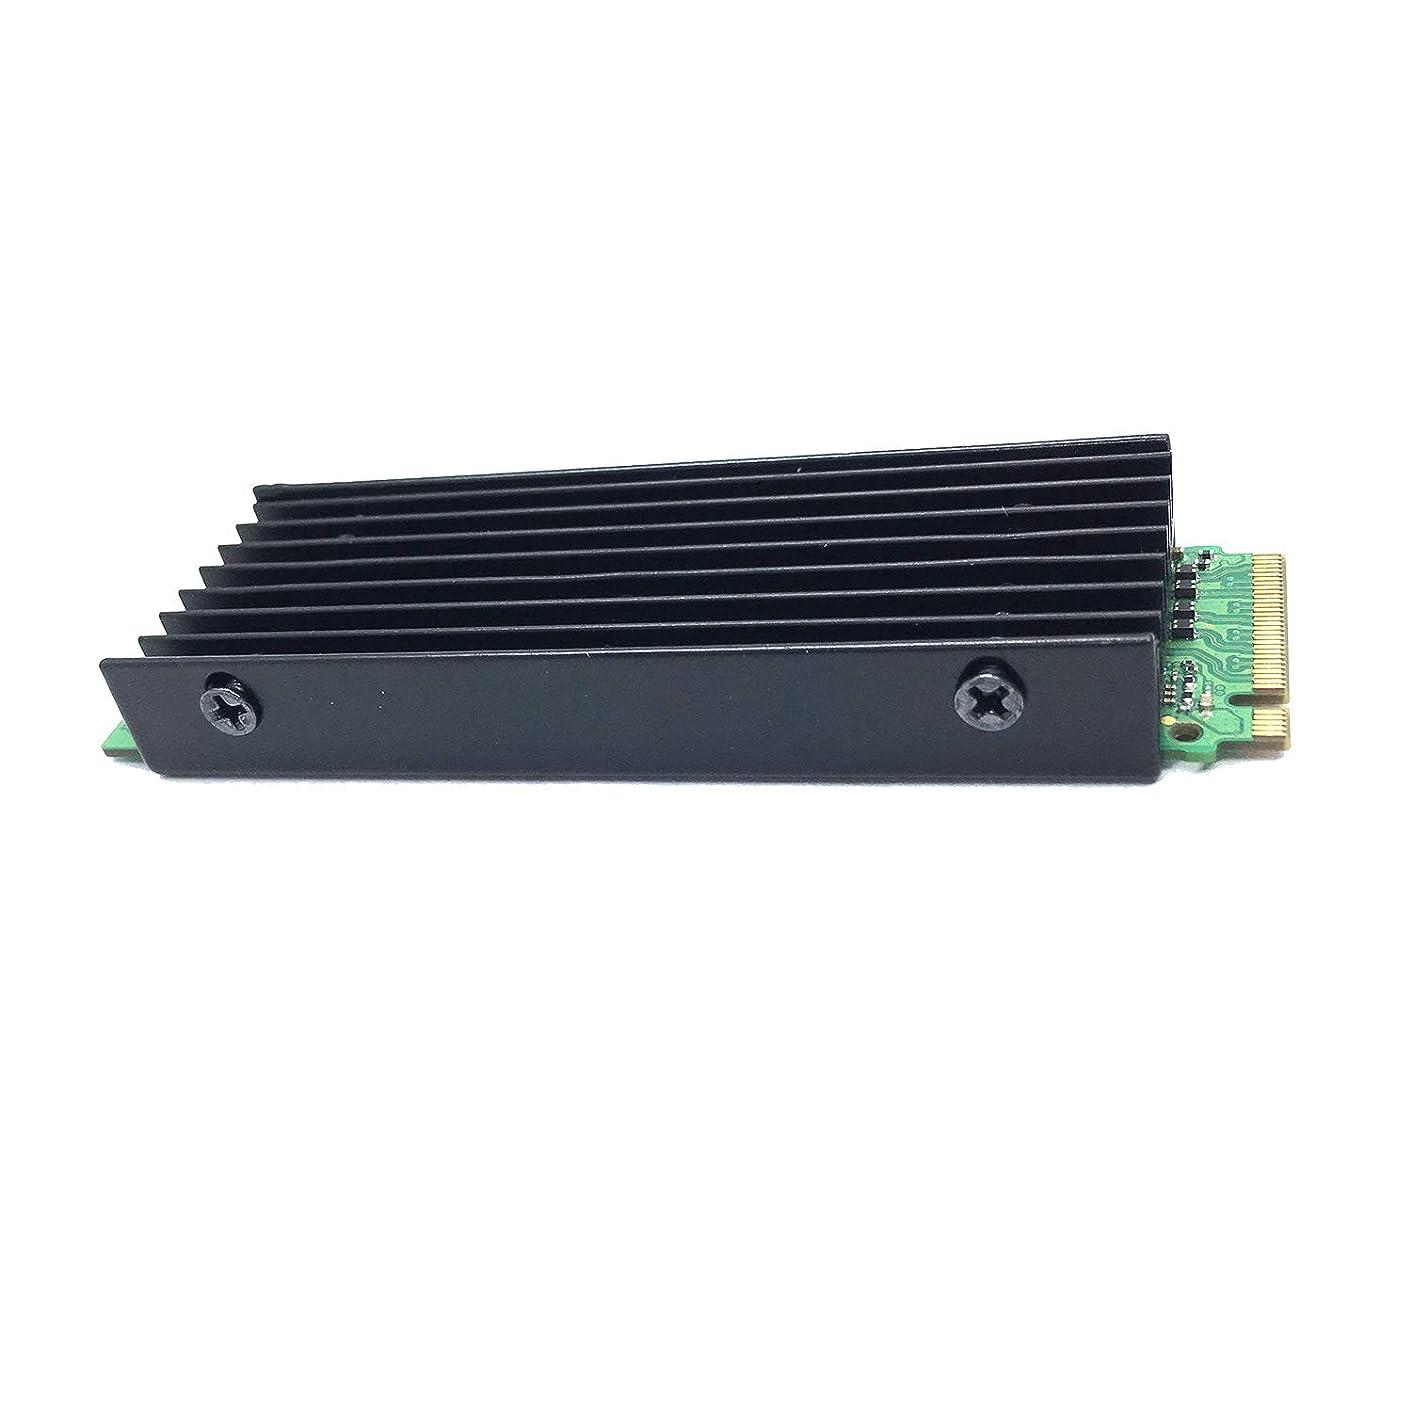 PCIe NVMe M.2 SSD Heatsinks Cooler with Thermal Pad (Black)